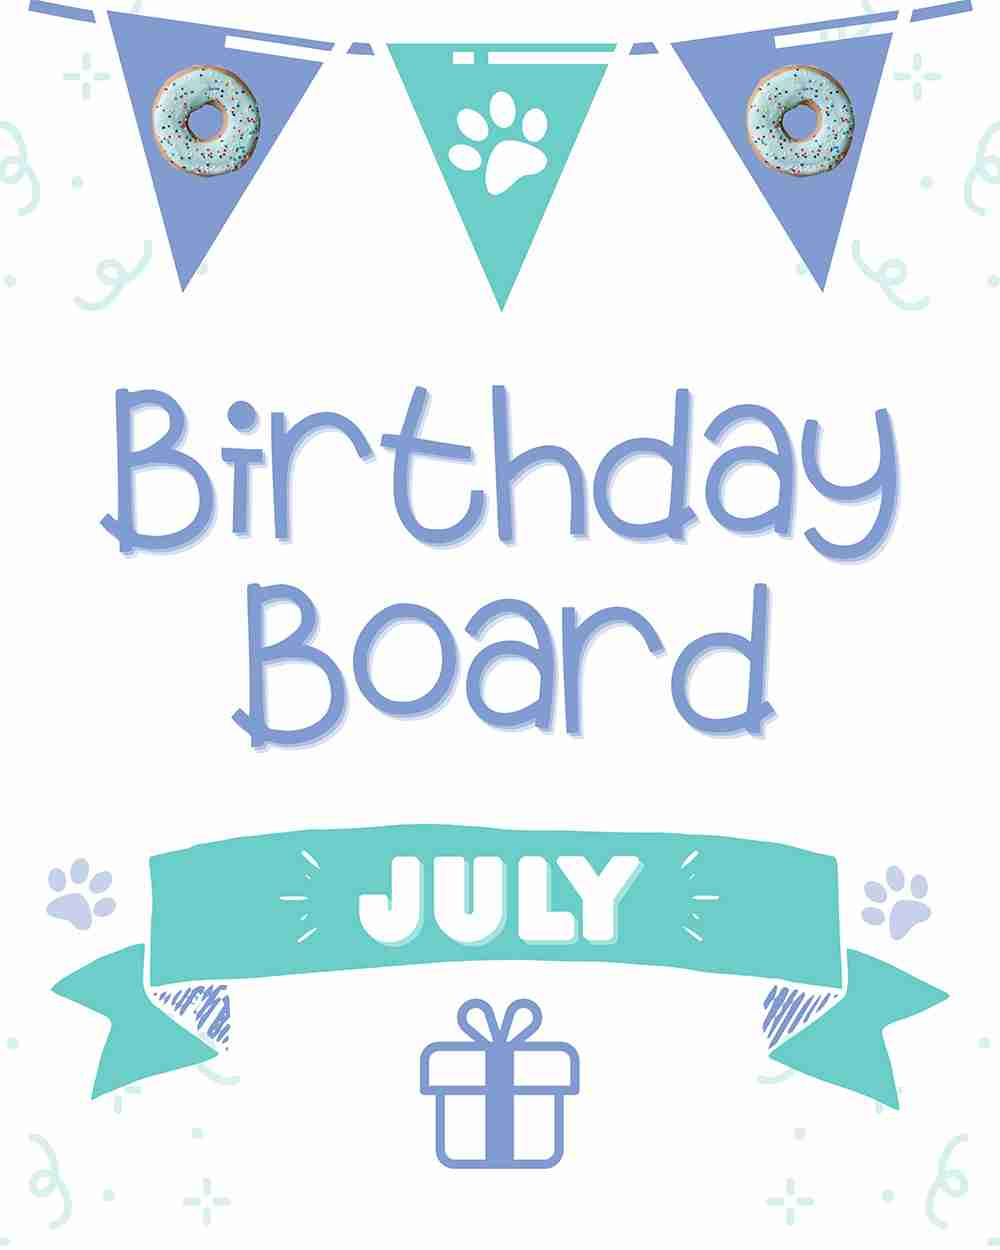 Wüfers Birthday Board July 2020